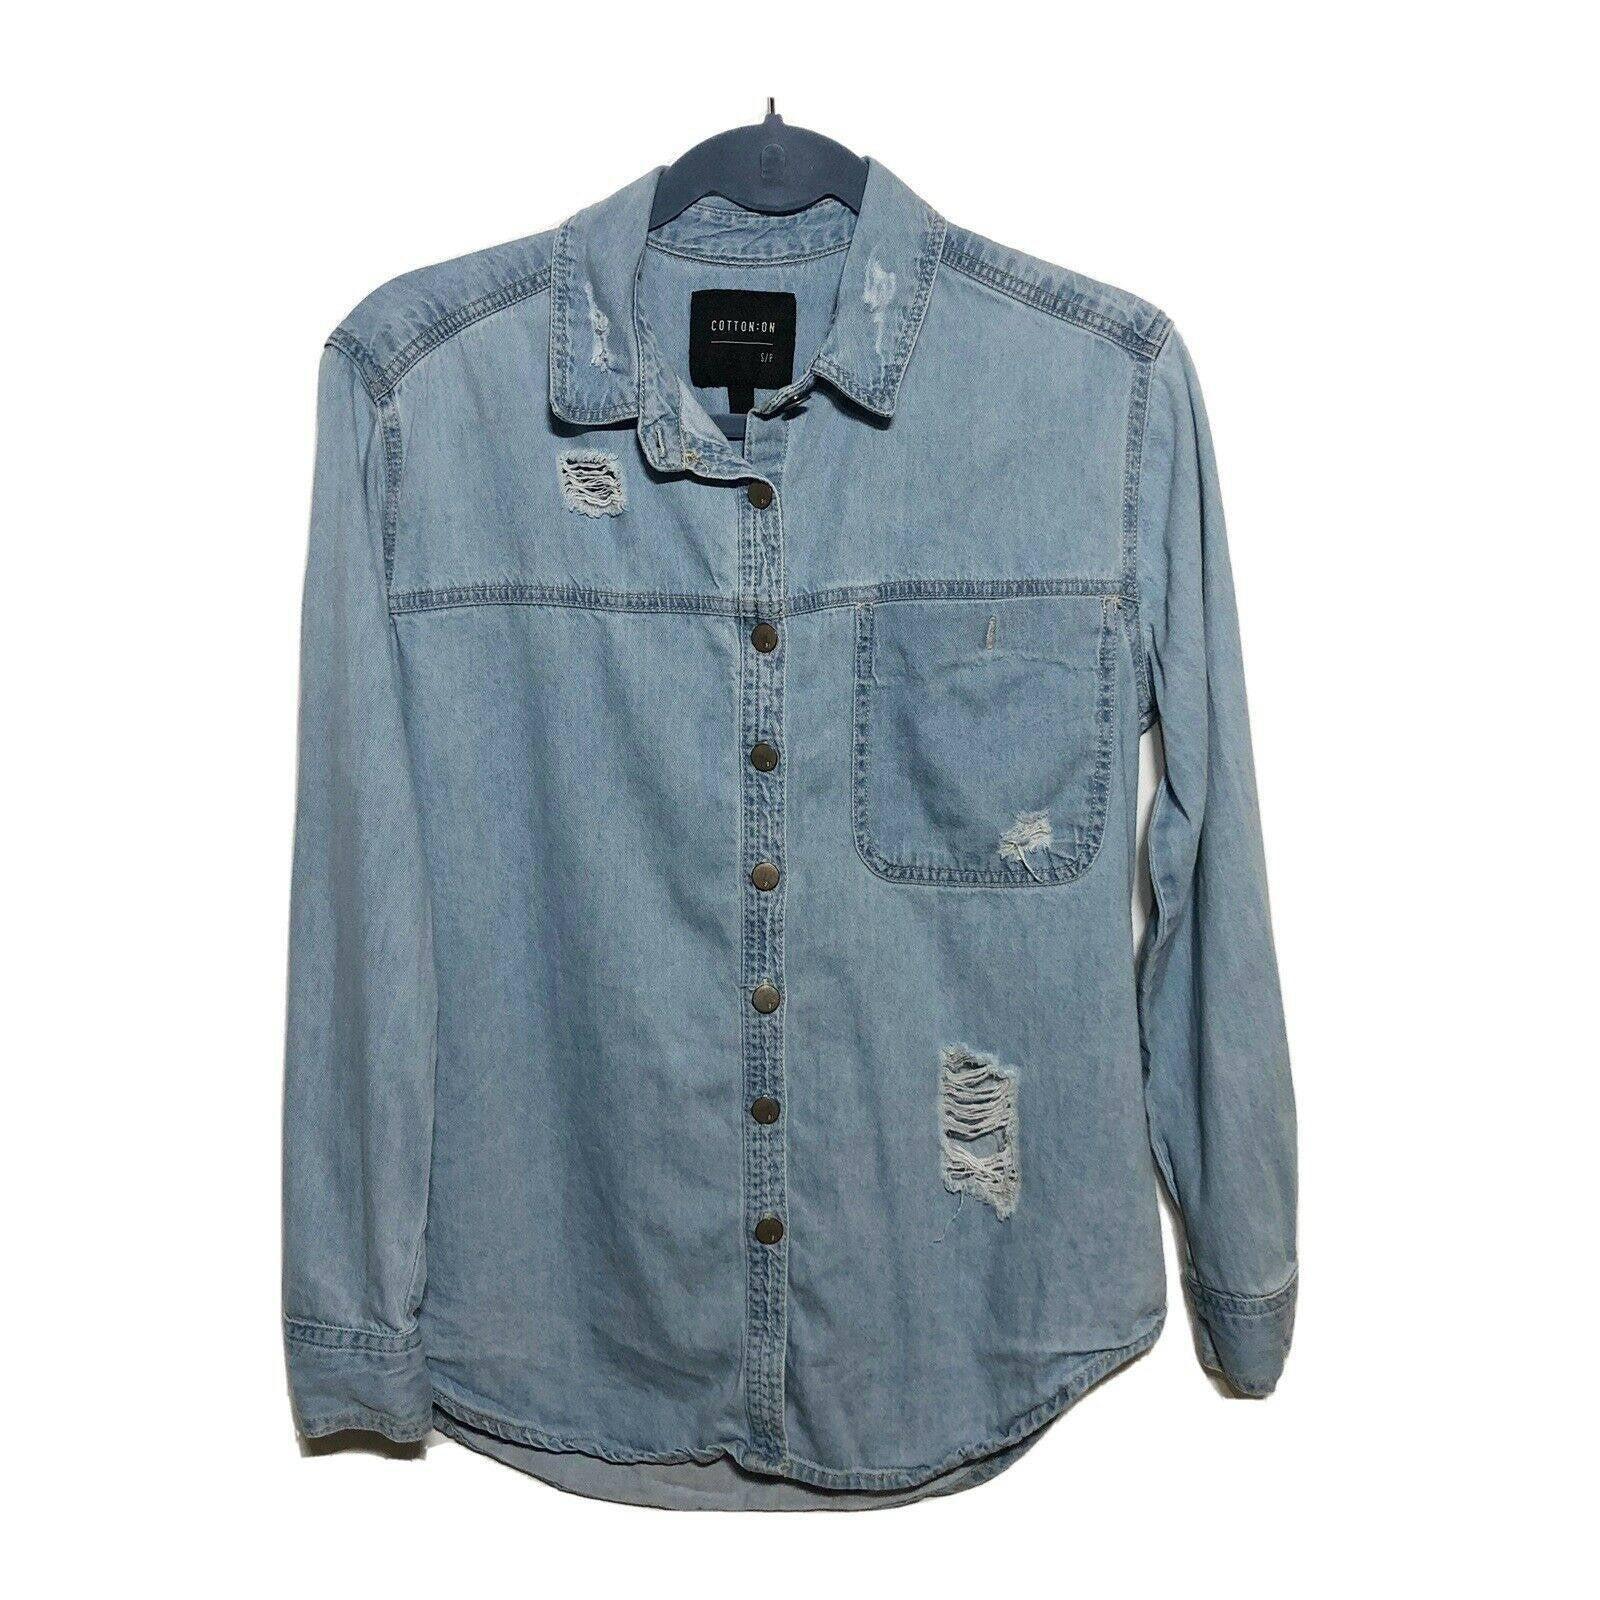 Cotton On Chambray Denim Shirt Small